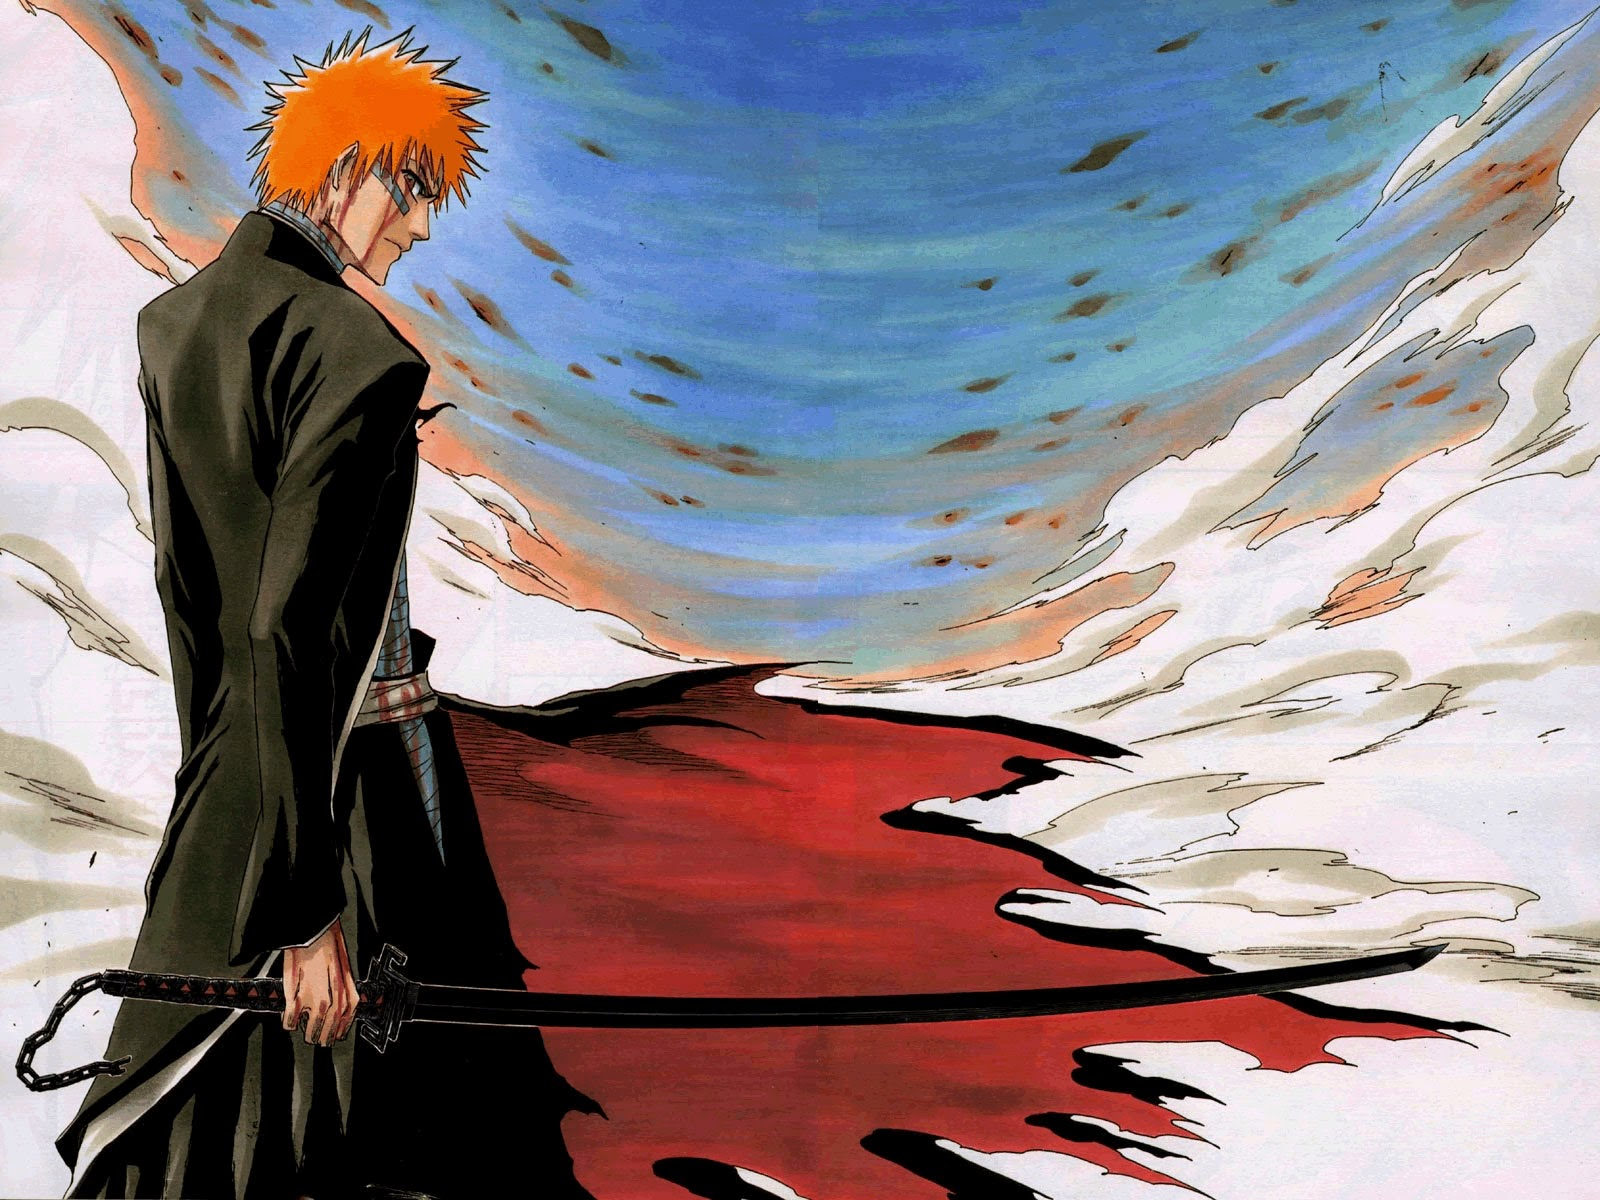 The Final Bleach Fantasy Round Ichigo Kurosaki Vs Cloud Strife The Kck World Wielding De